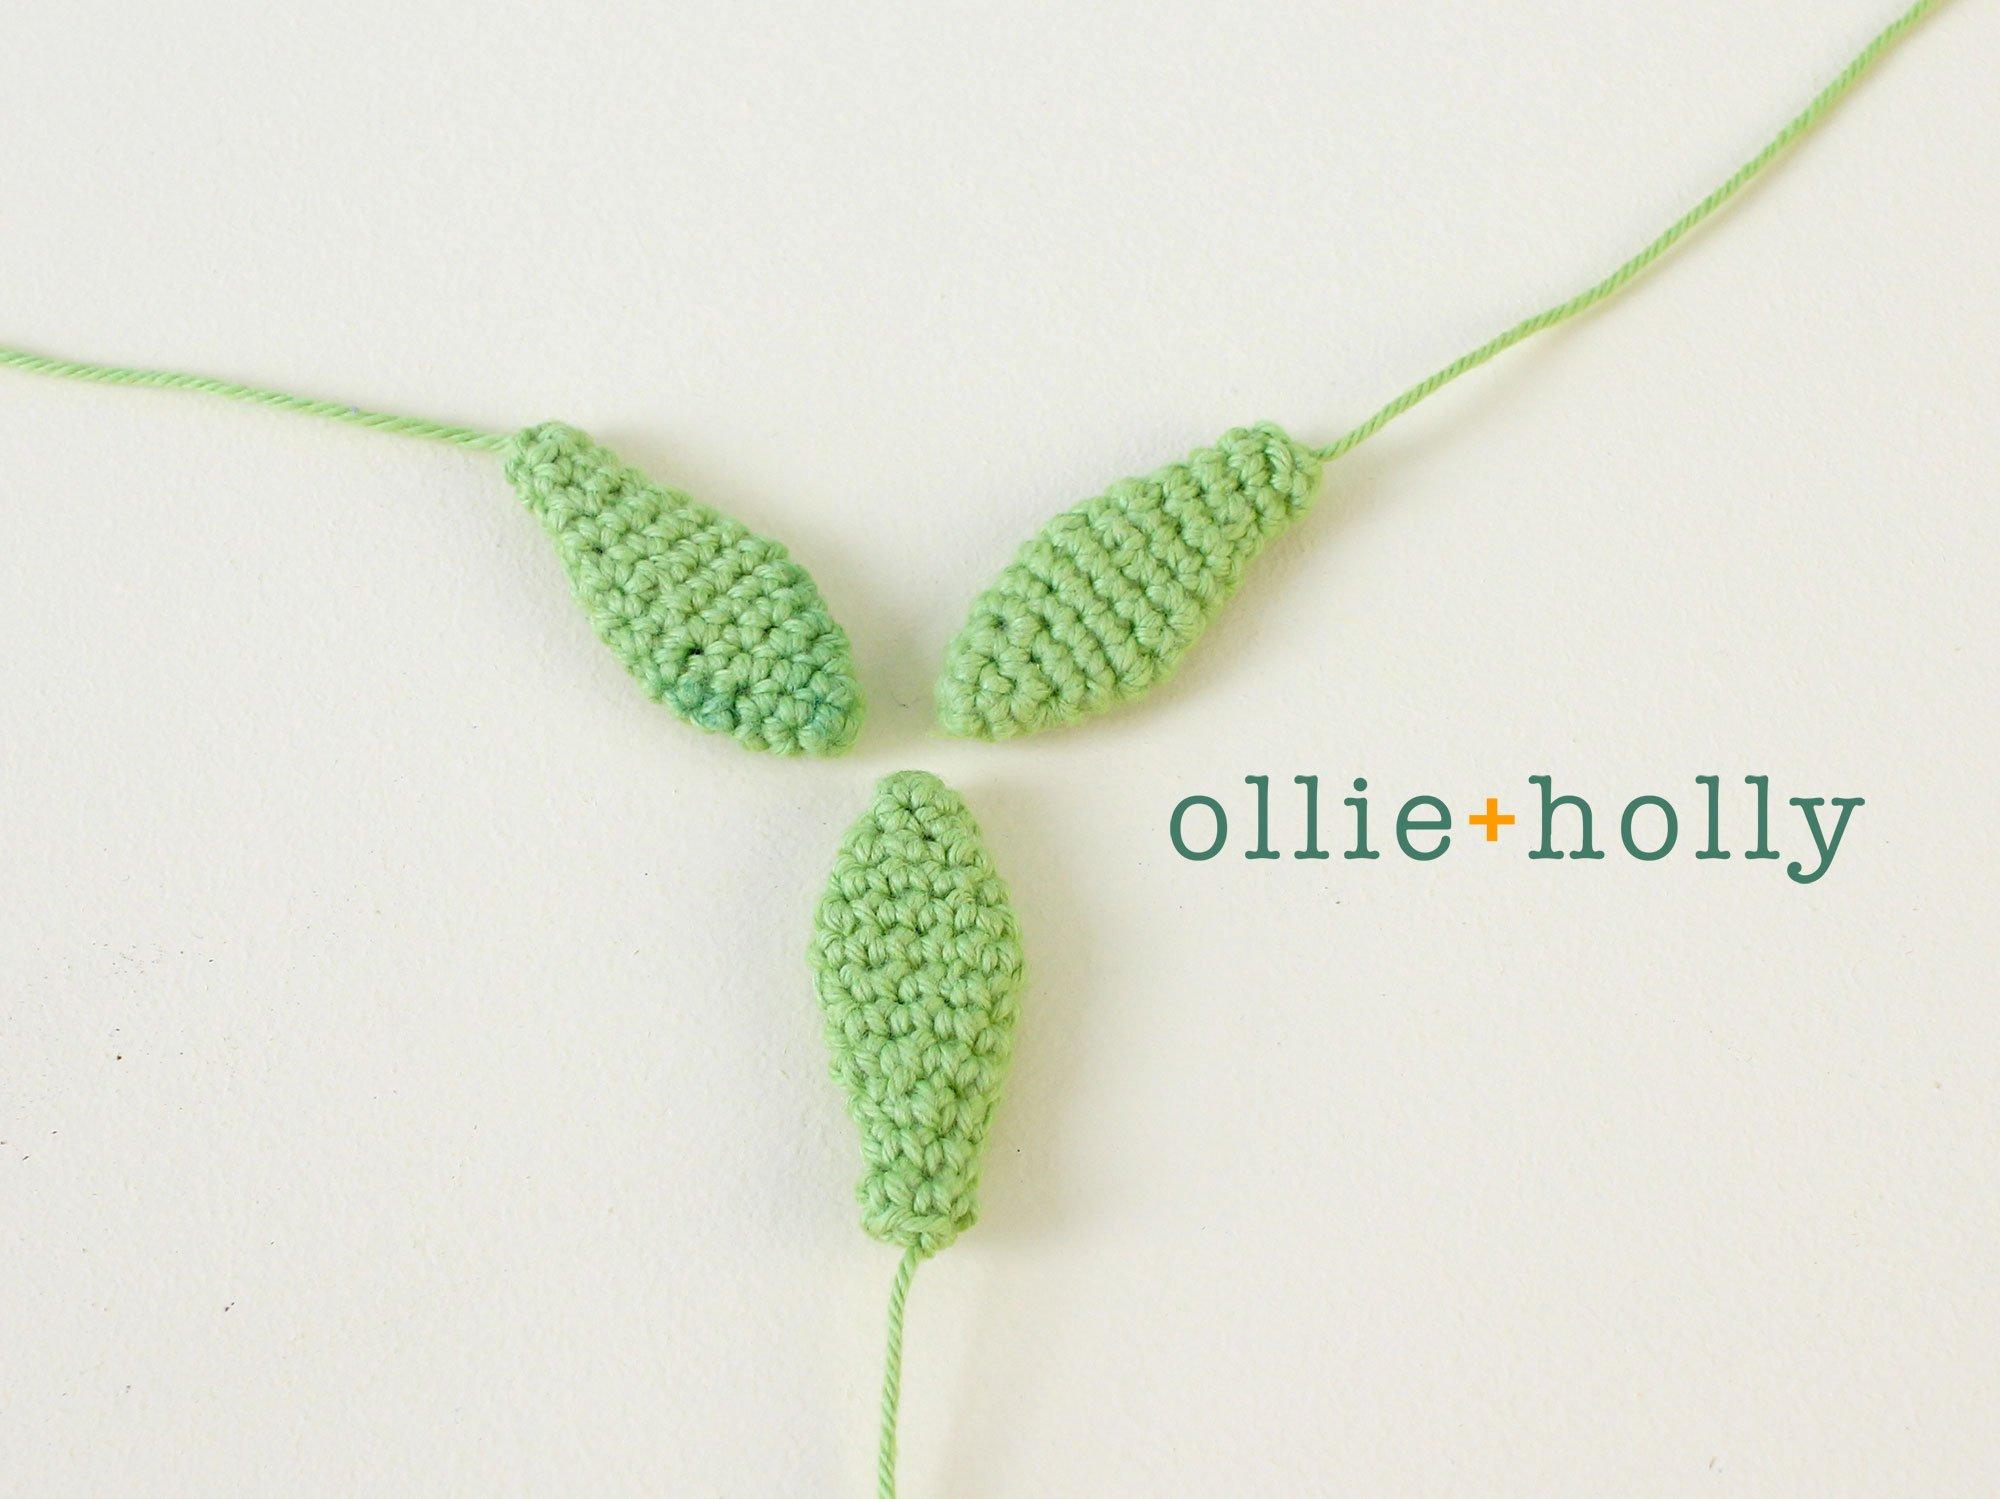 Free Sedum Adolphii Succulents (Golden Glow) Amigurumi Crochet Pattern Step 2